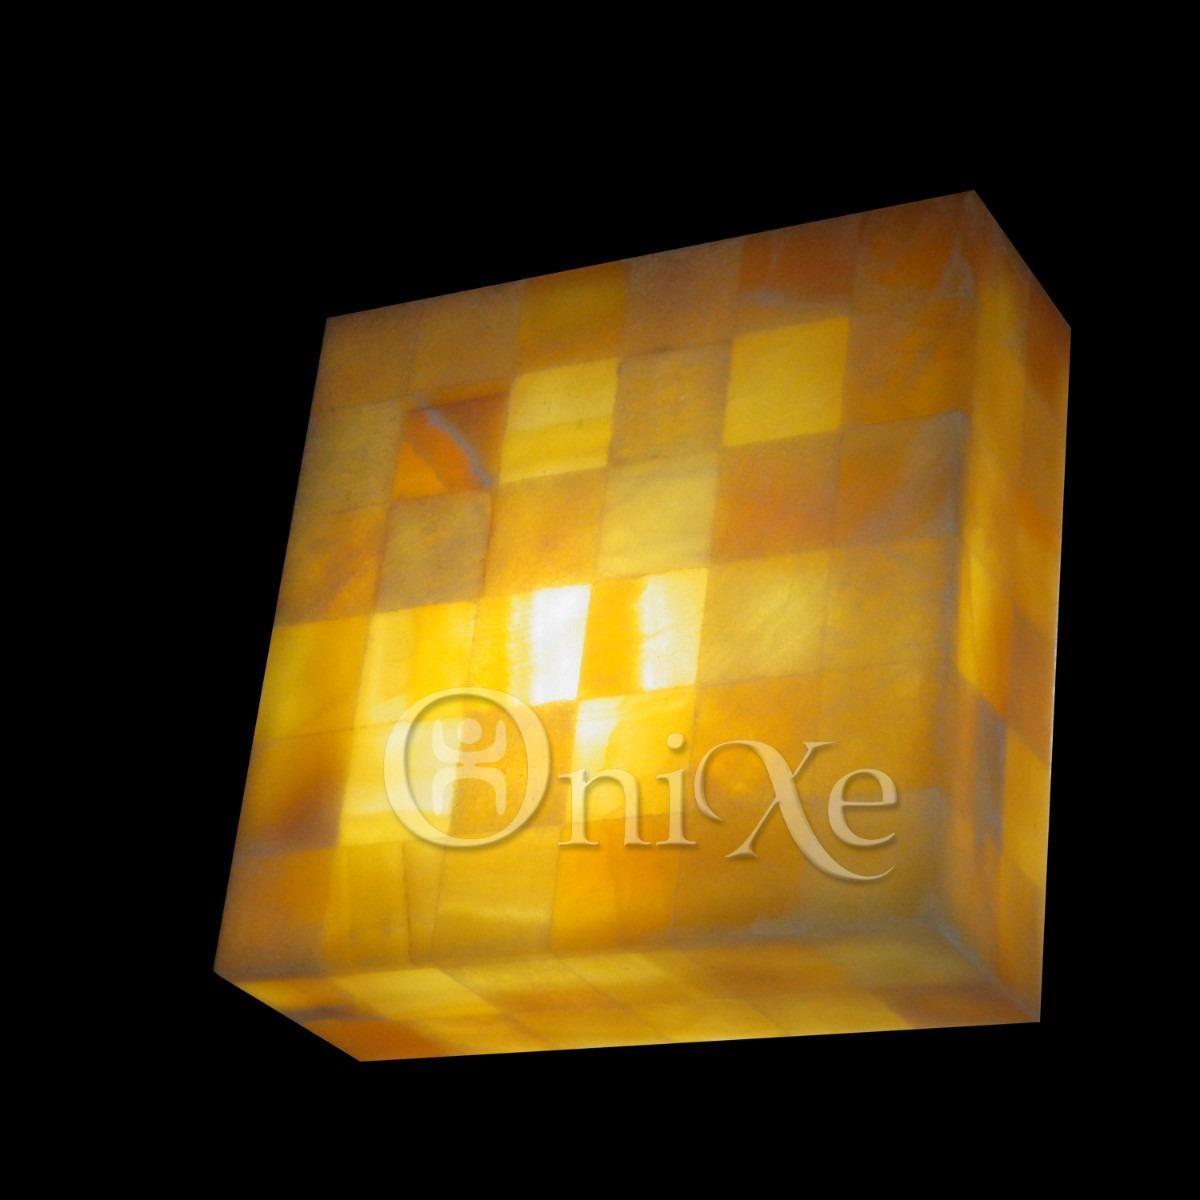 Iluminacion Para Baños Mercado Libre:Lamparas De Onix De Pared – $ 55000 en Mercado Libre